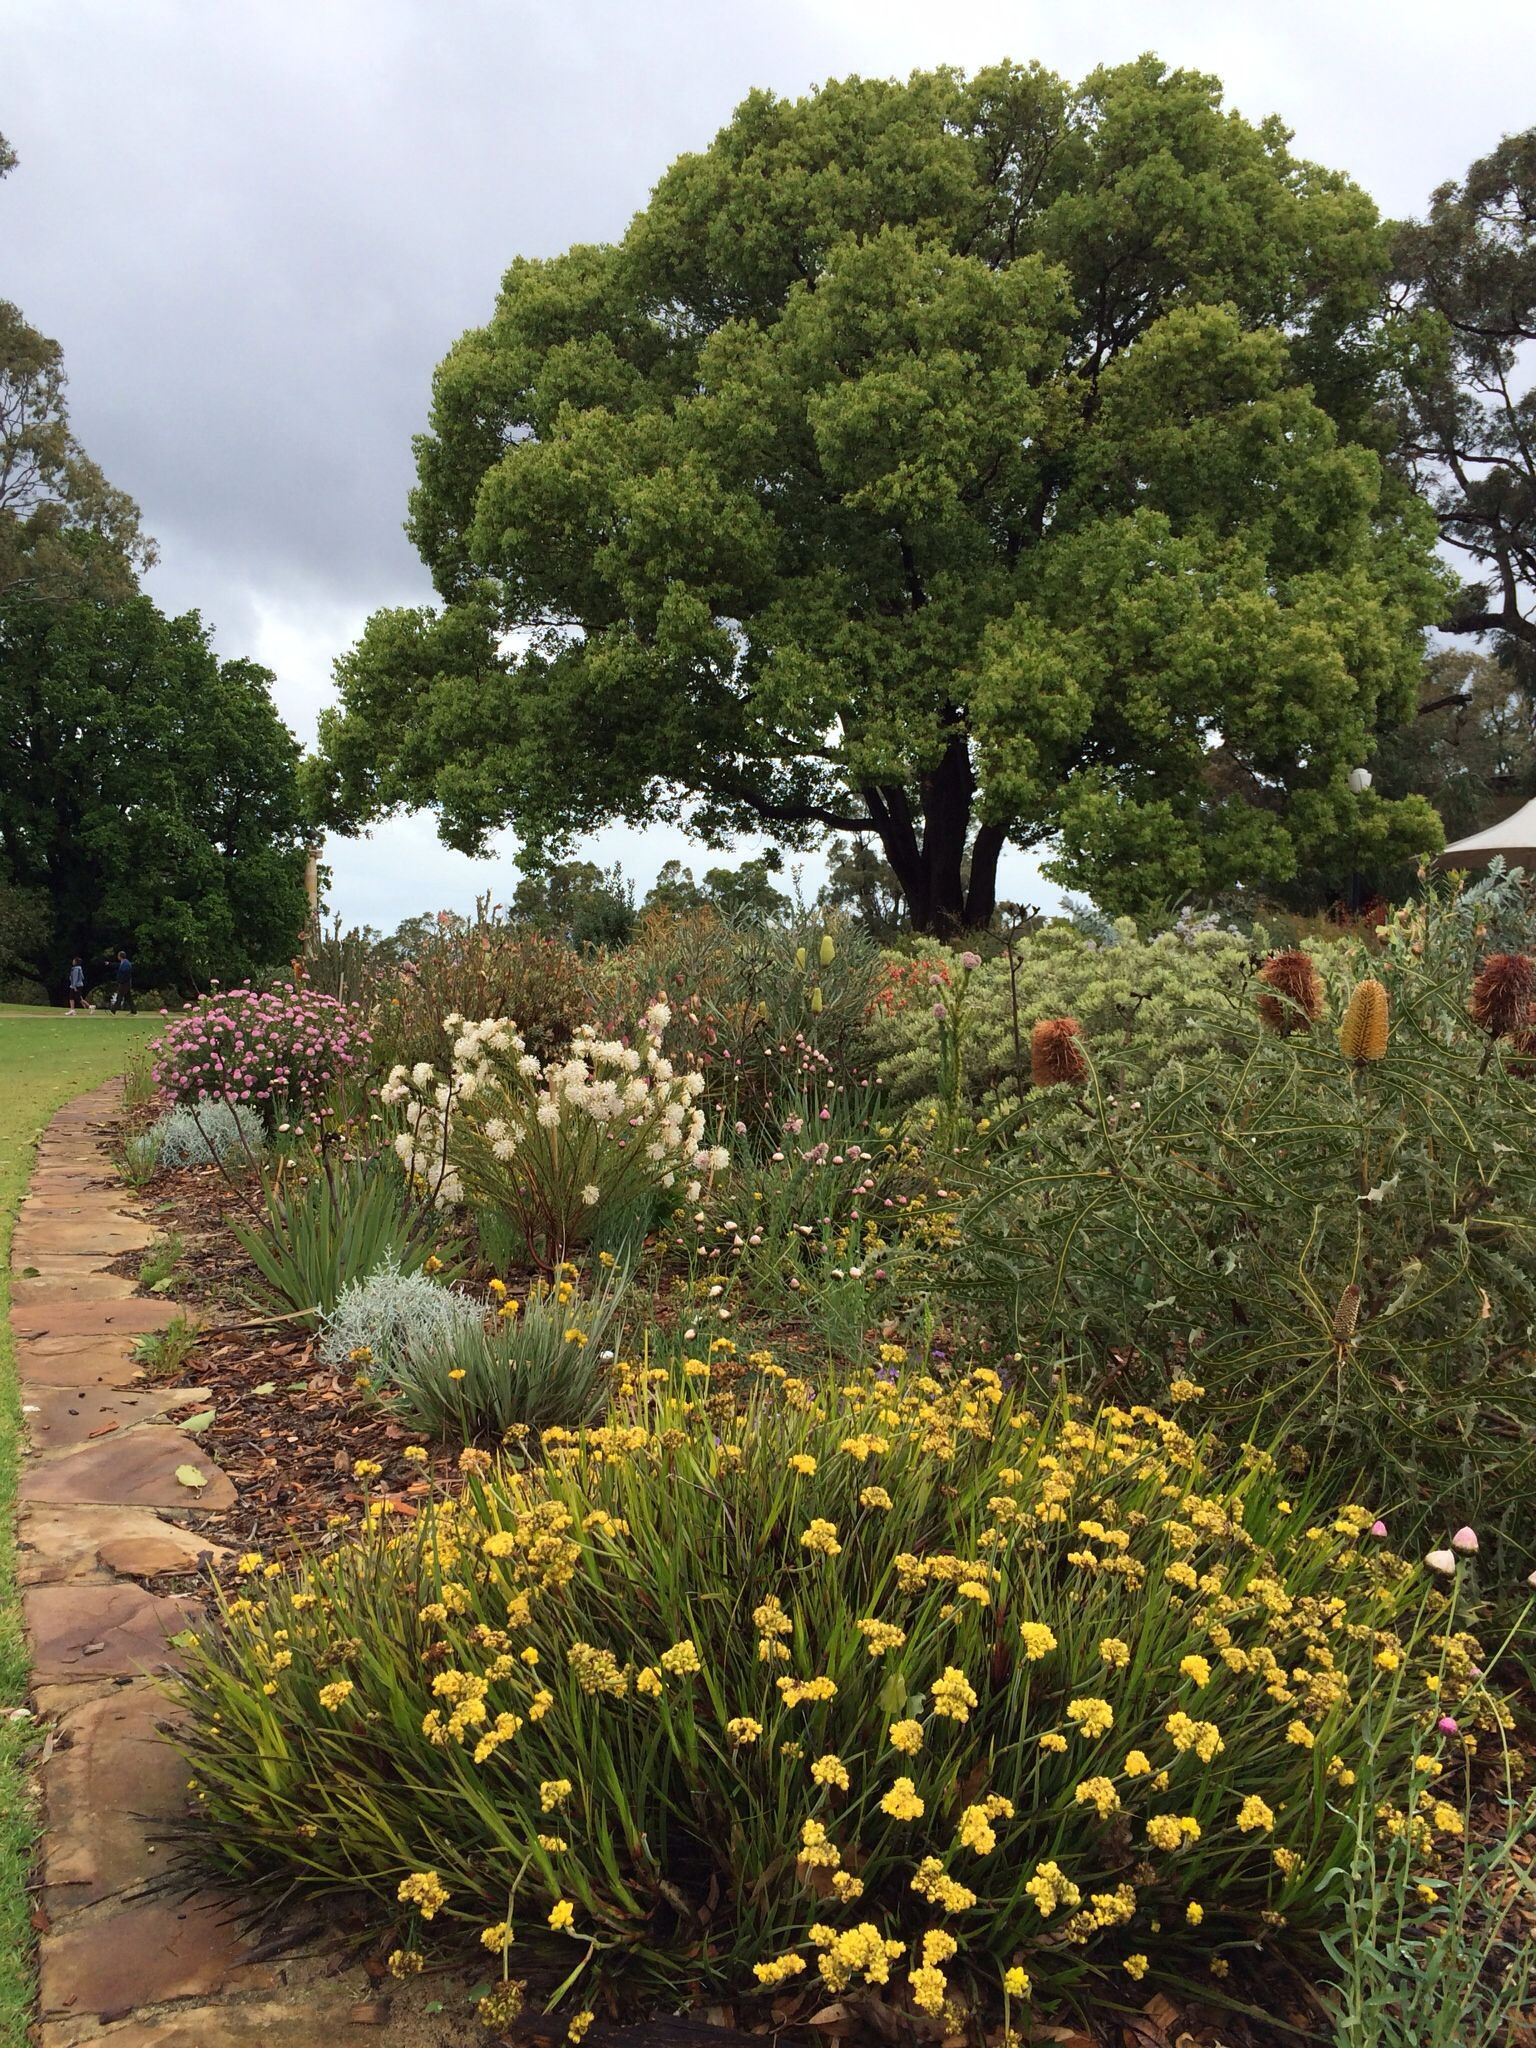 Kings Park, Perth, Western Australia | Garden | Pinterest | Perth ...